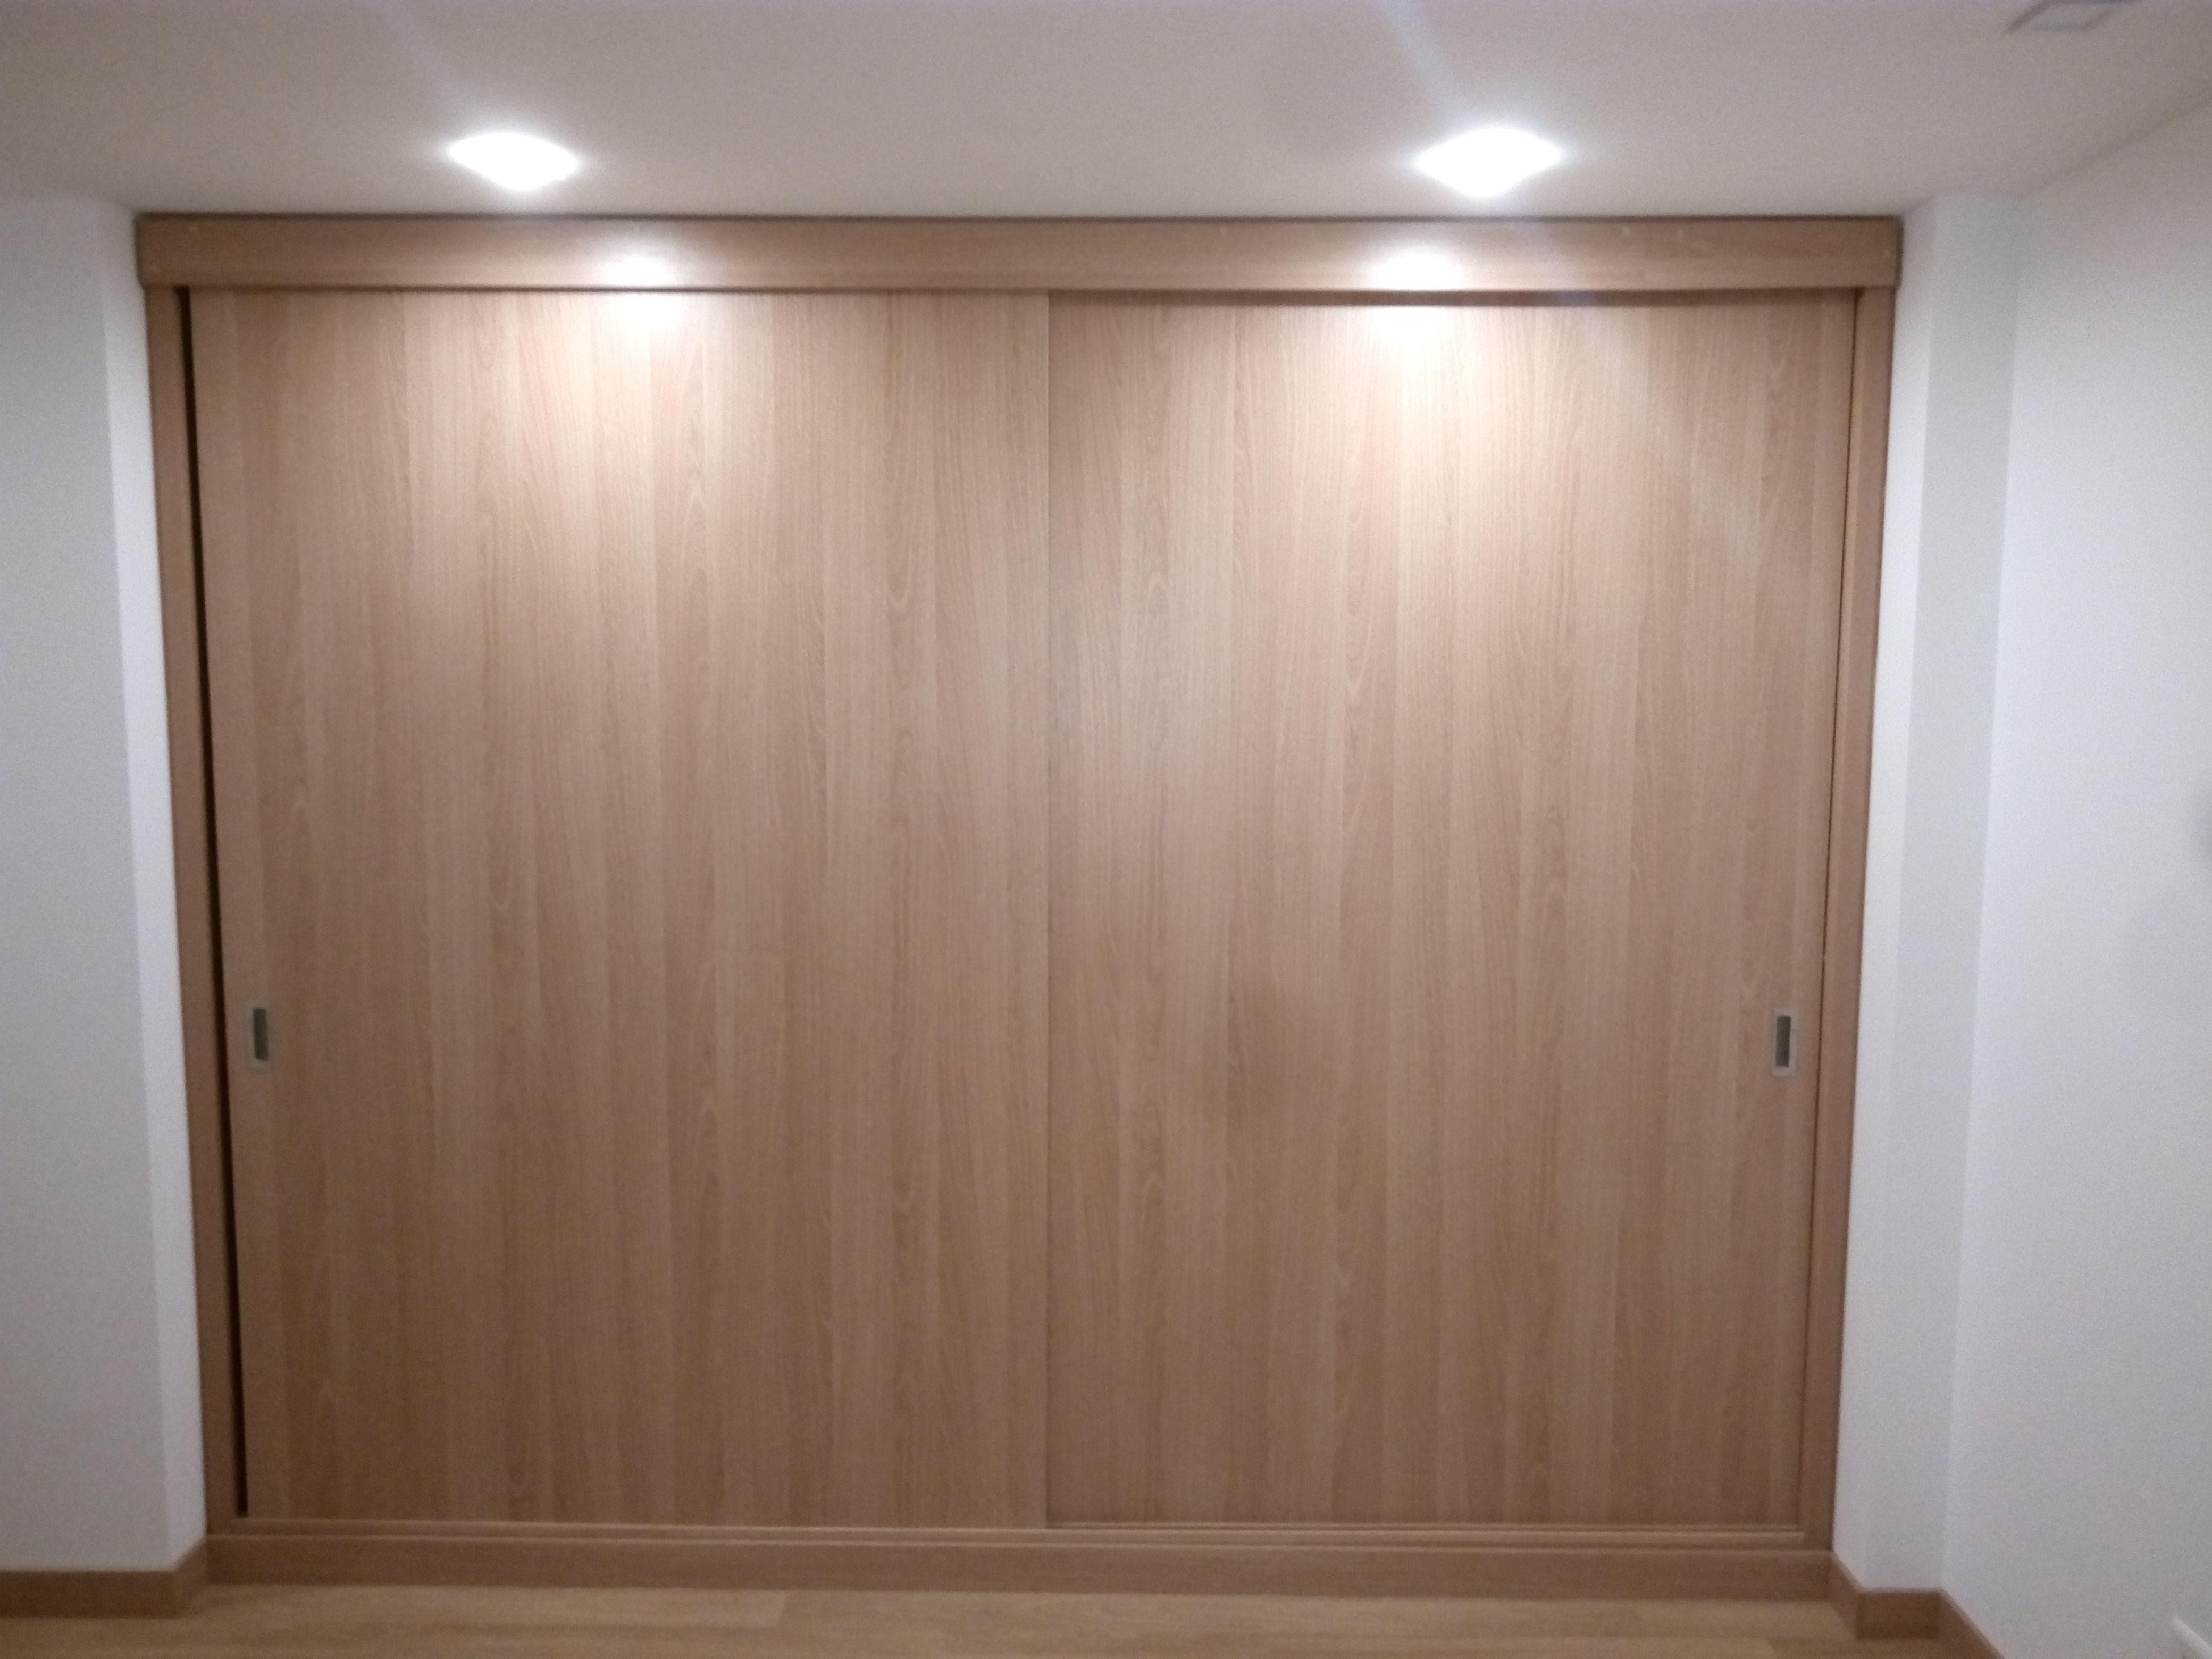 Dise o puertas corredizas closet pinterest portones for Diseno puerta